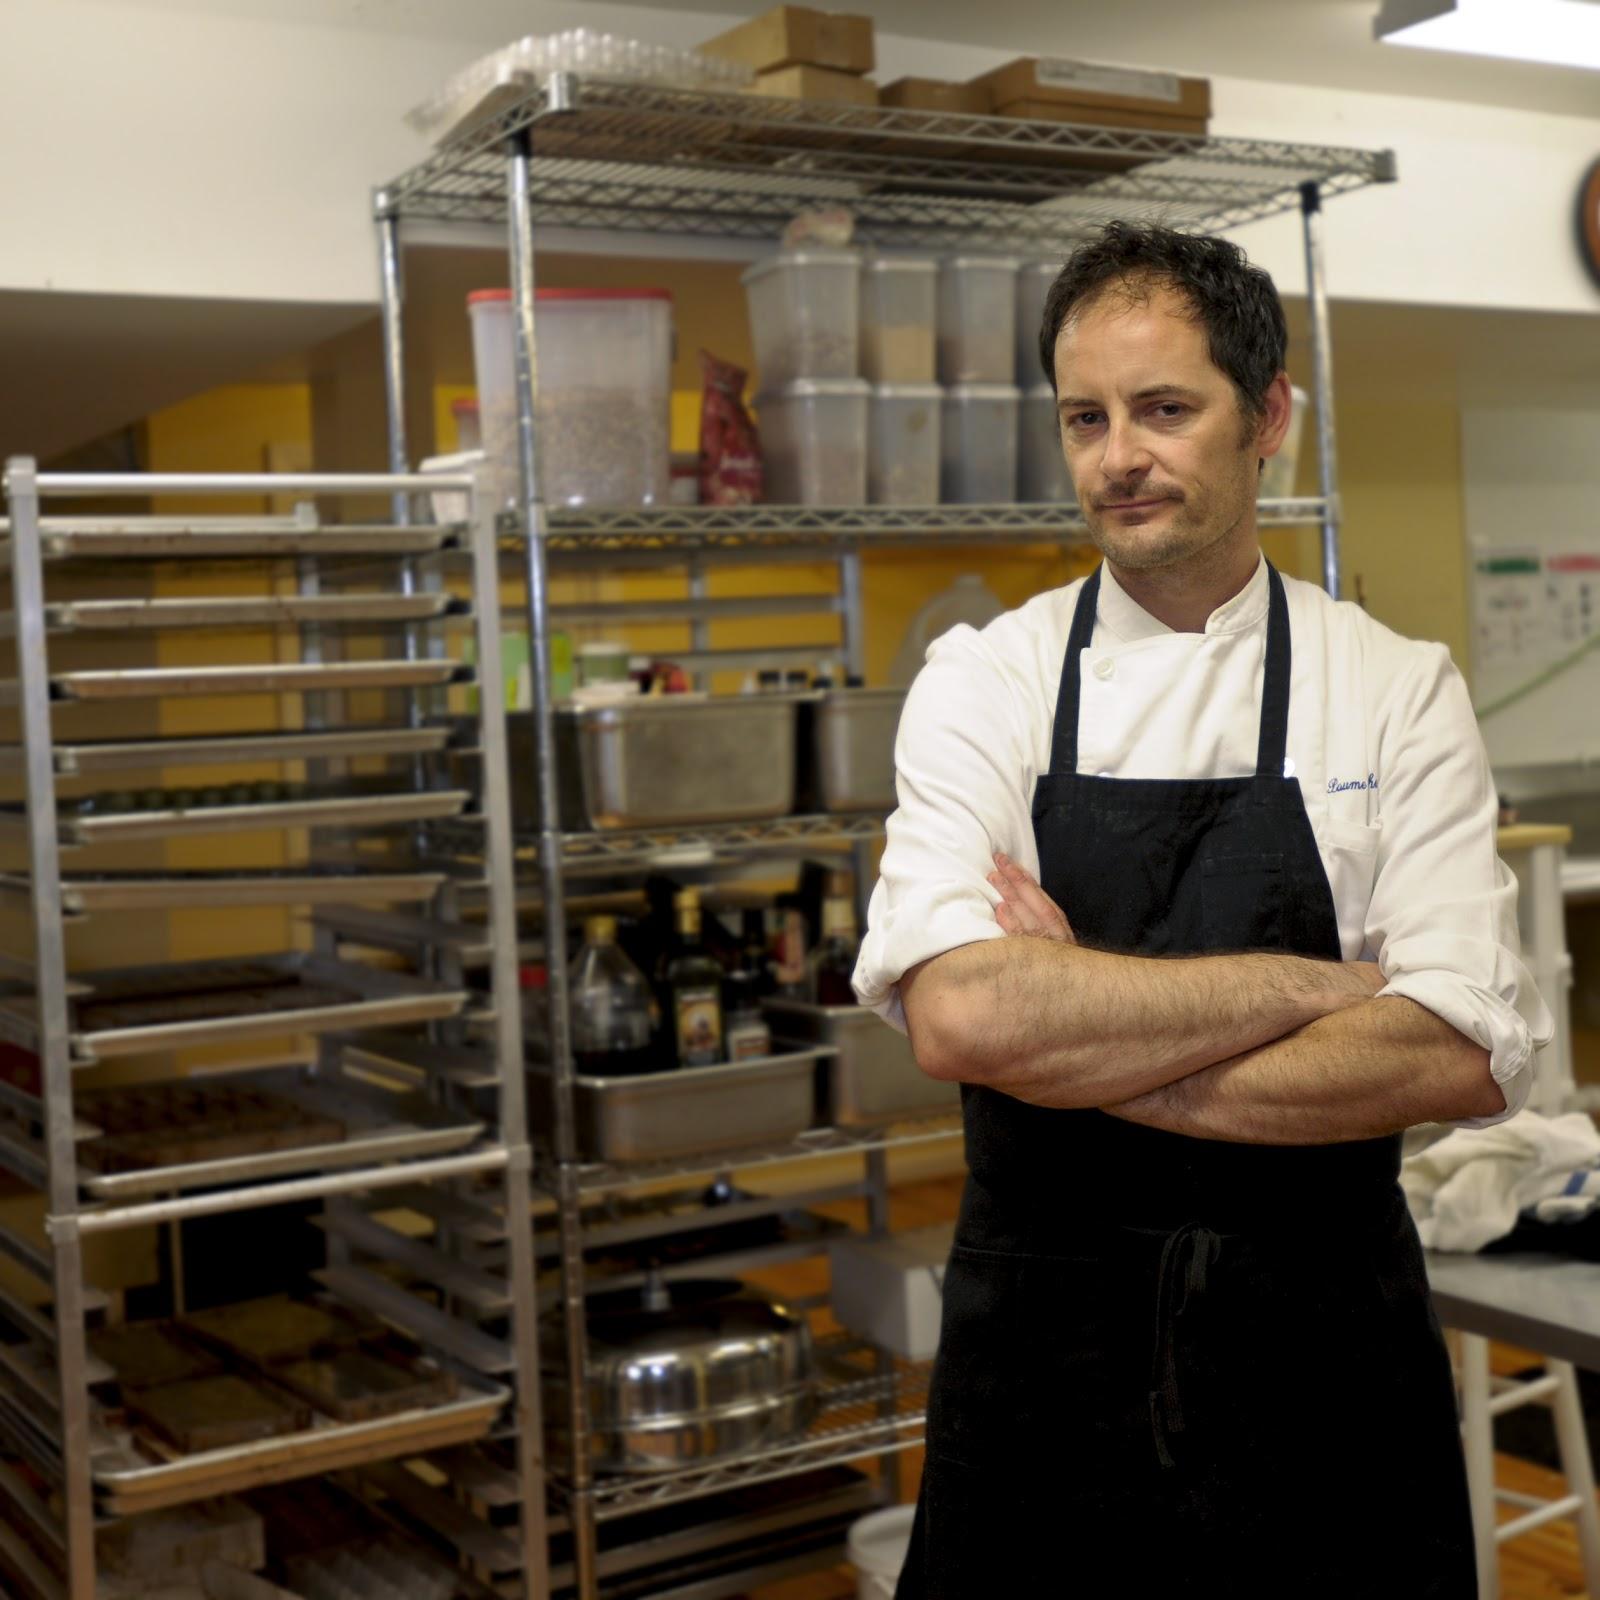 Christophe Paume - 3rd Generation Chocolatier